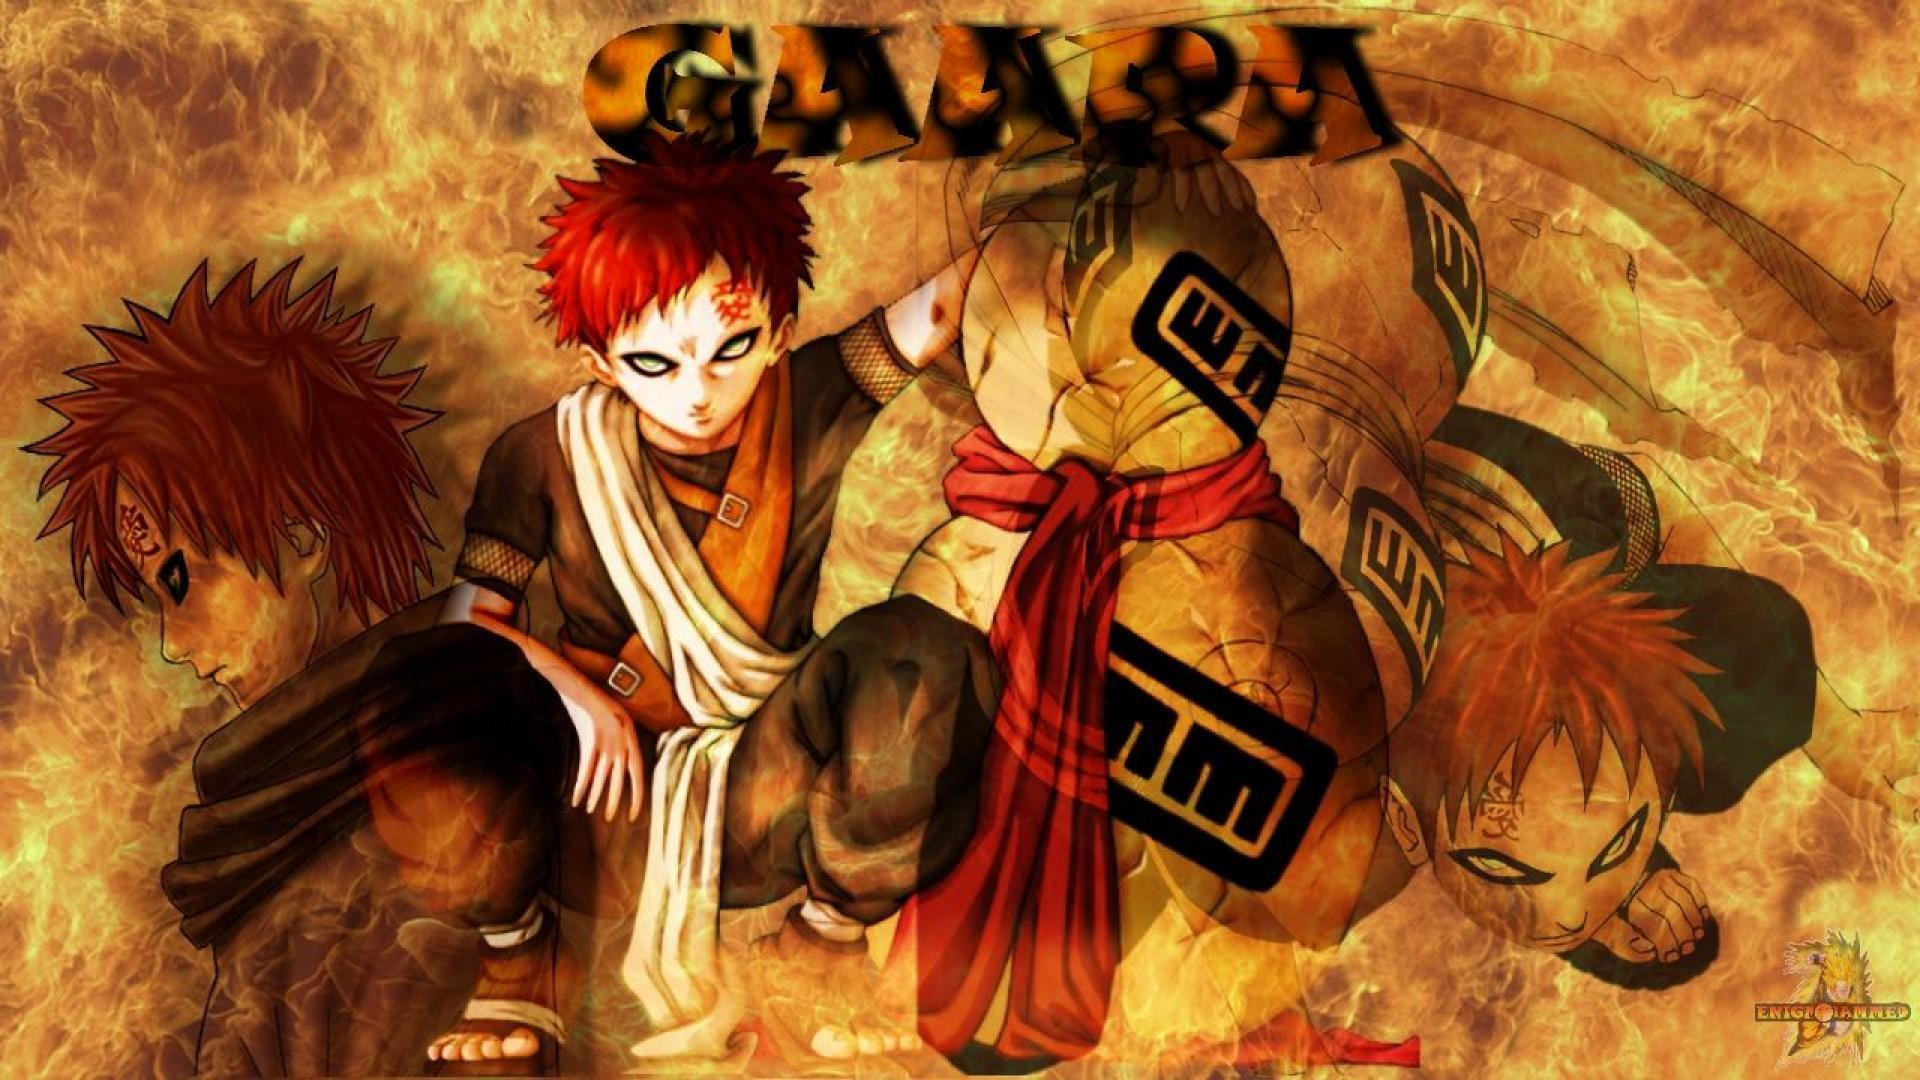 Gaara Background 60 Pictures